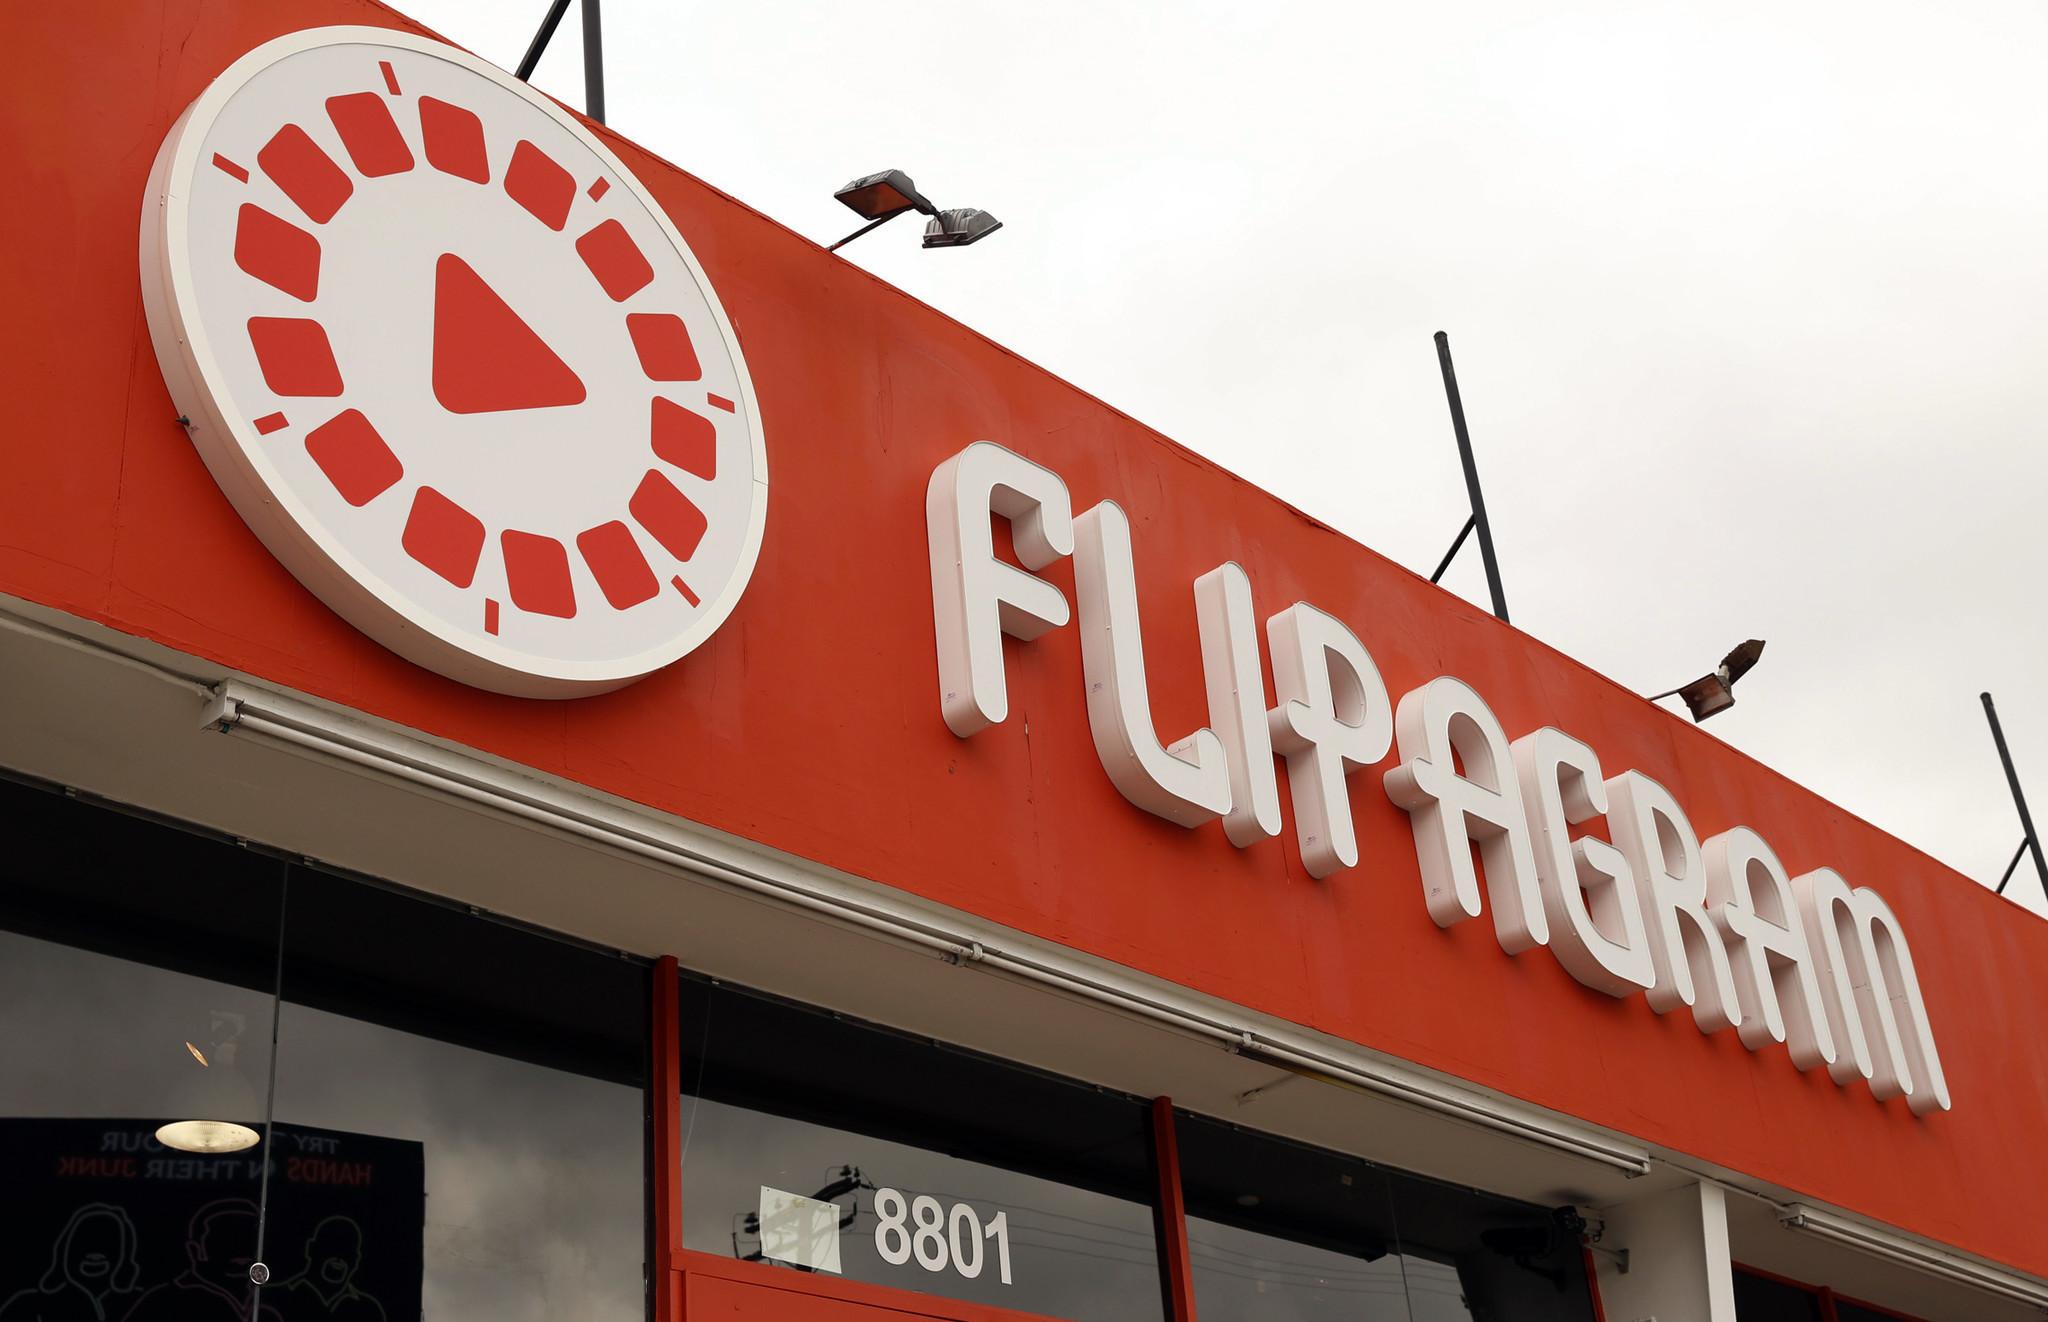 Flipagramm